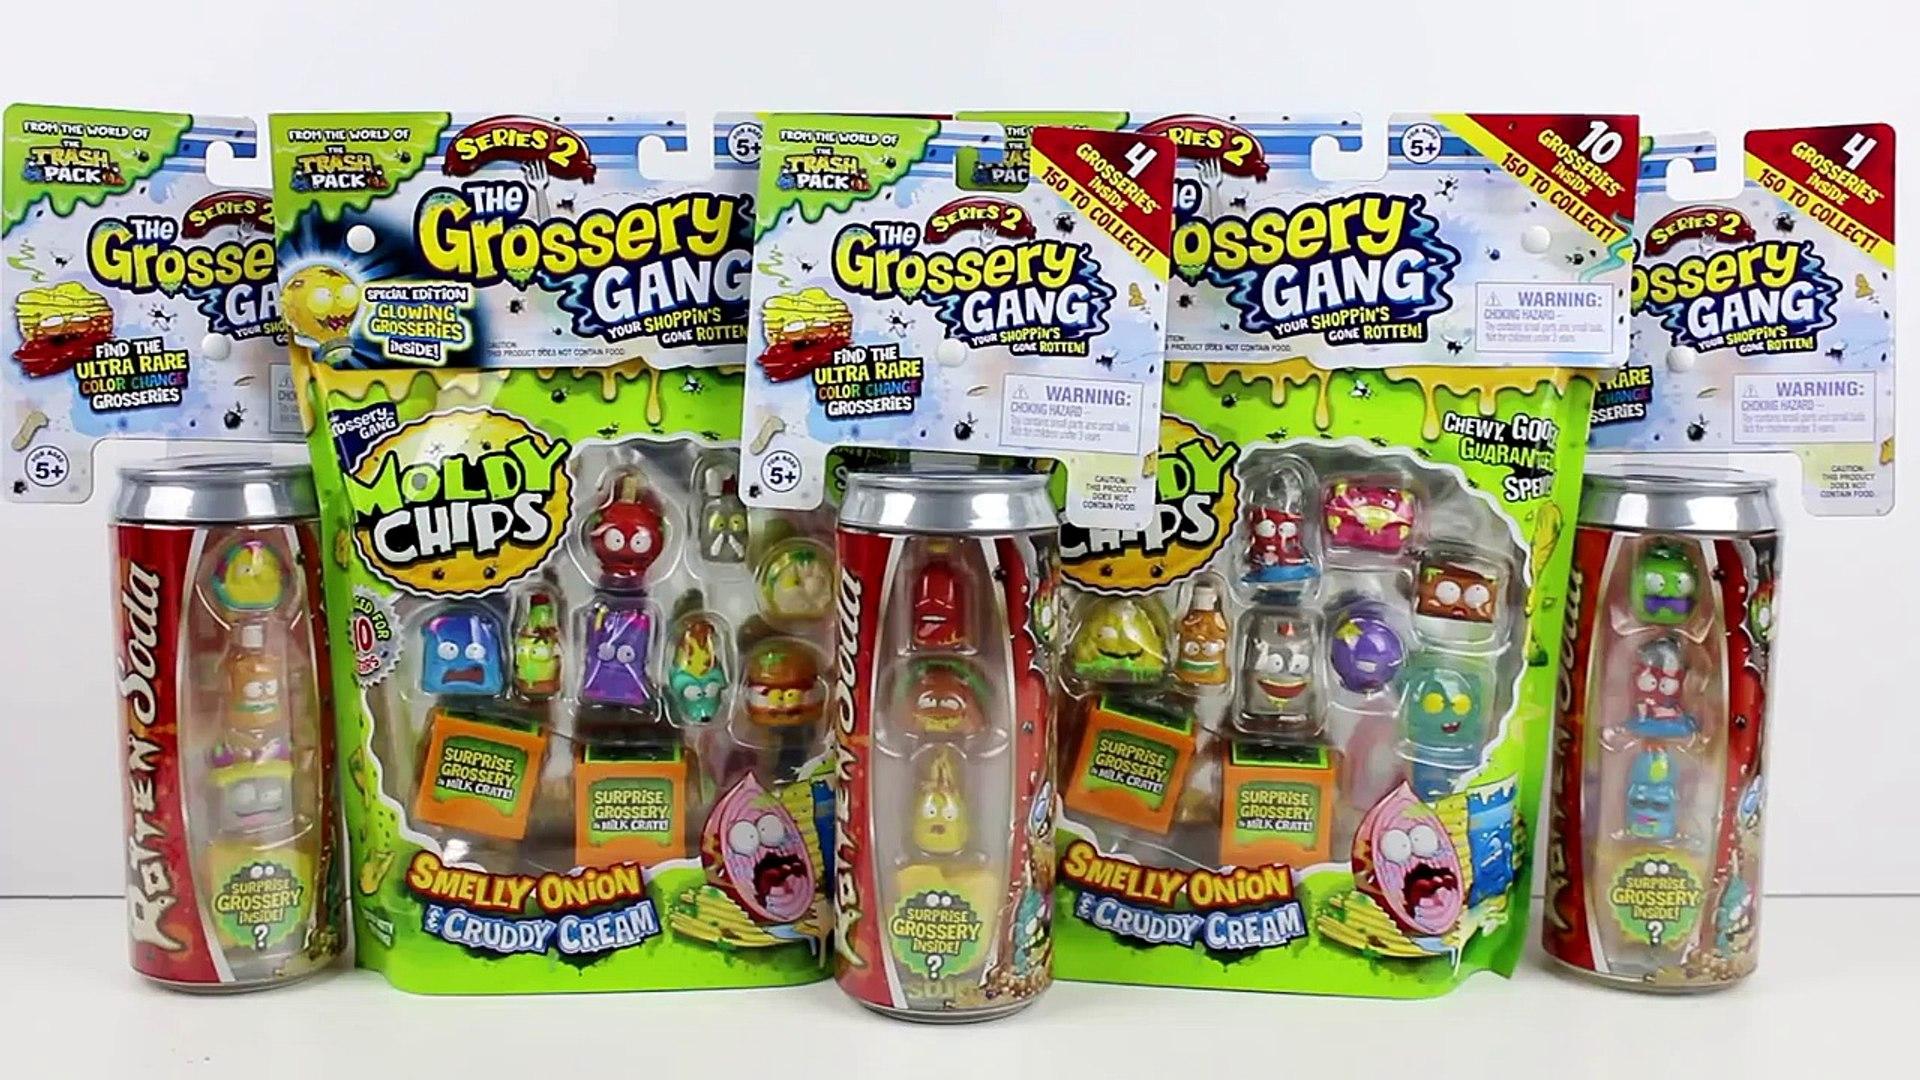 The Grossery Gang S2 Rotten Soda 4-Pack